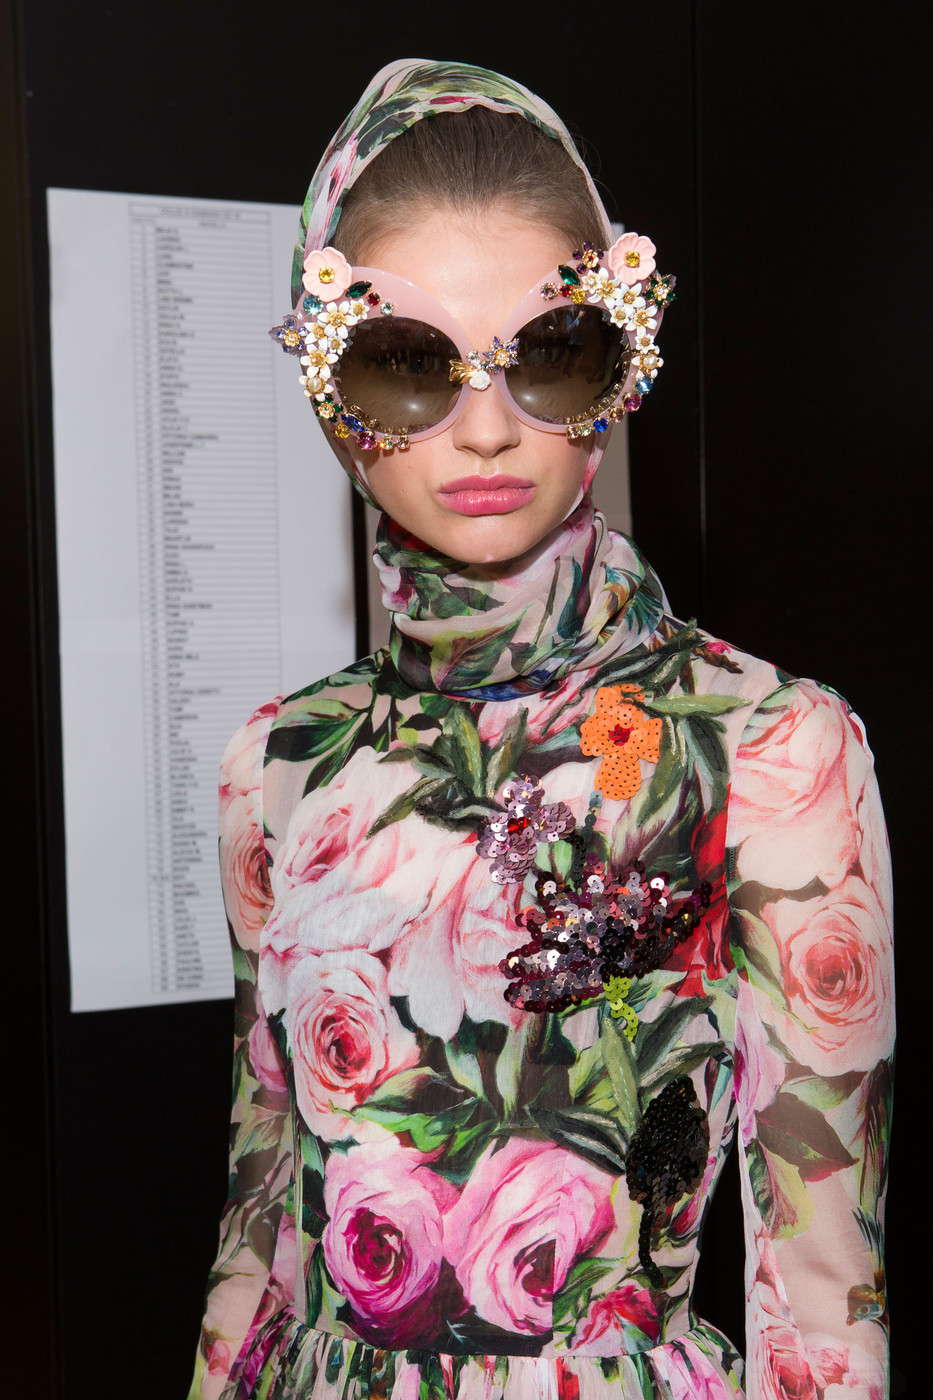 Dolce+Gabbana+Spring+2016+Backstage+XJxgDtx68nQx.jpg